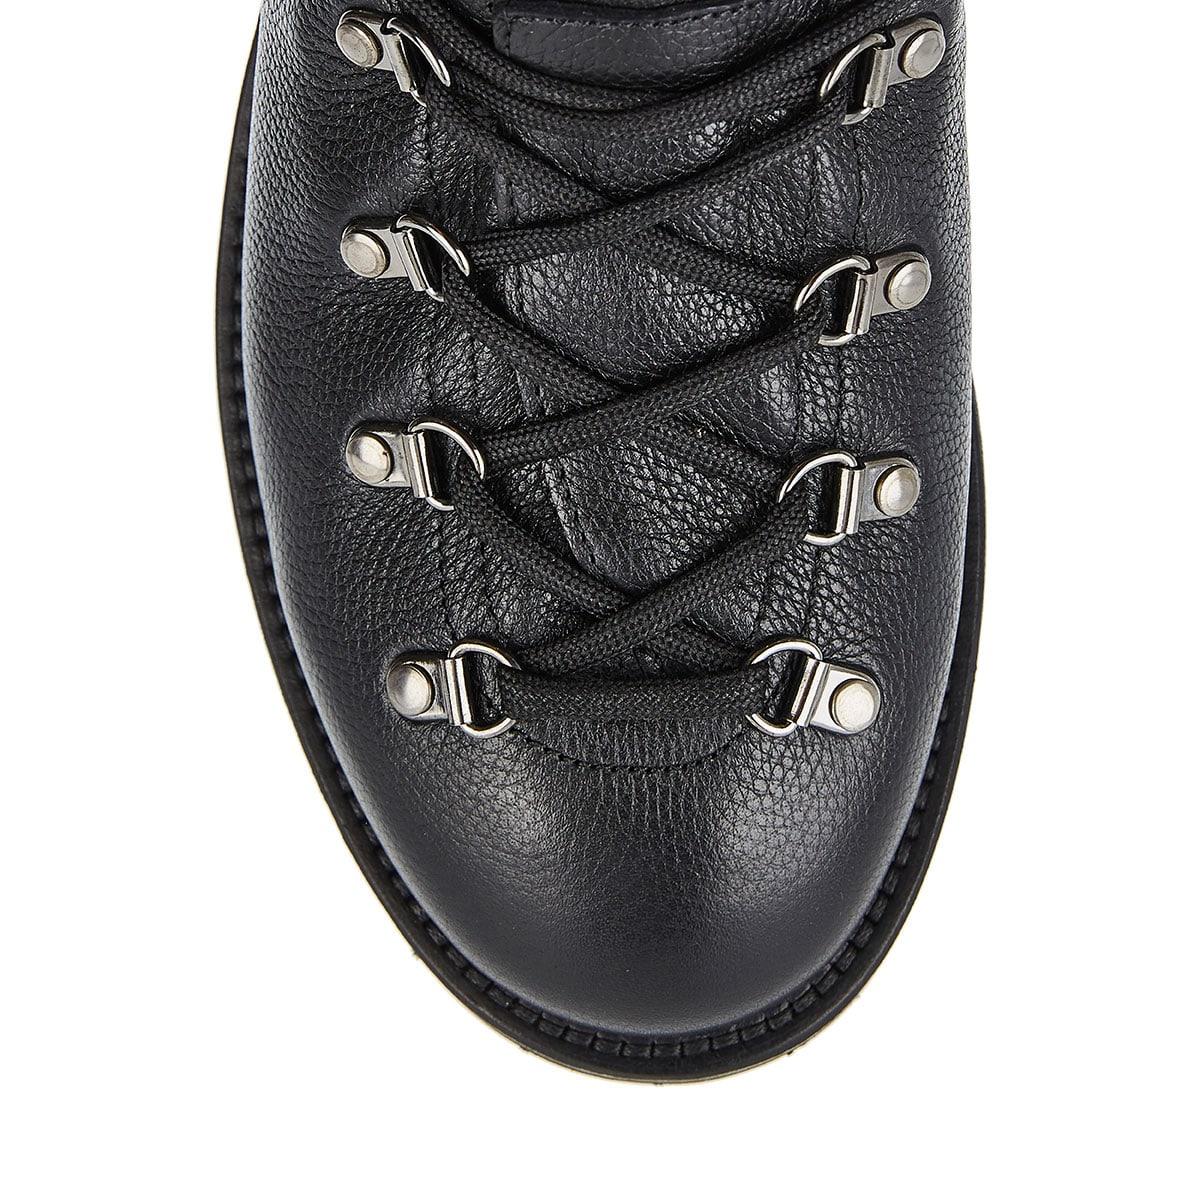 Peak leather hiking boots